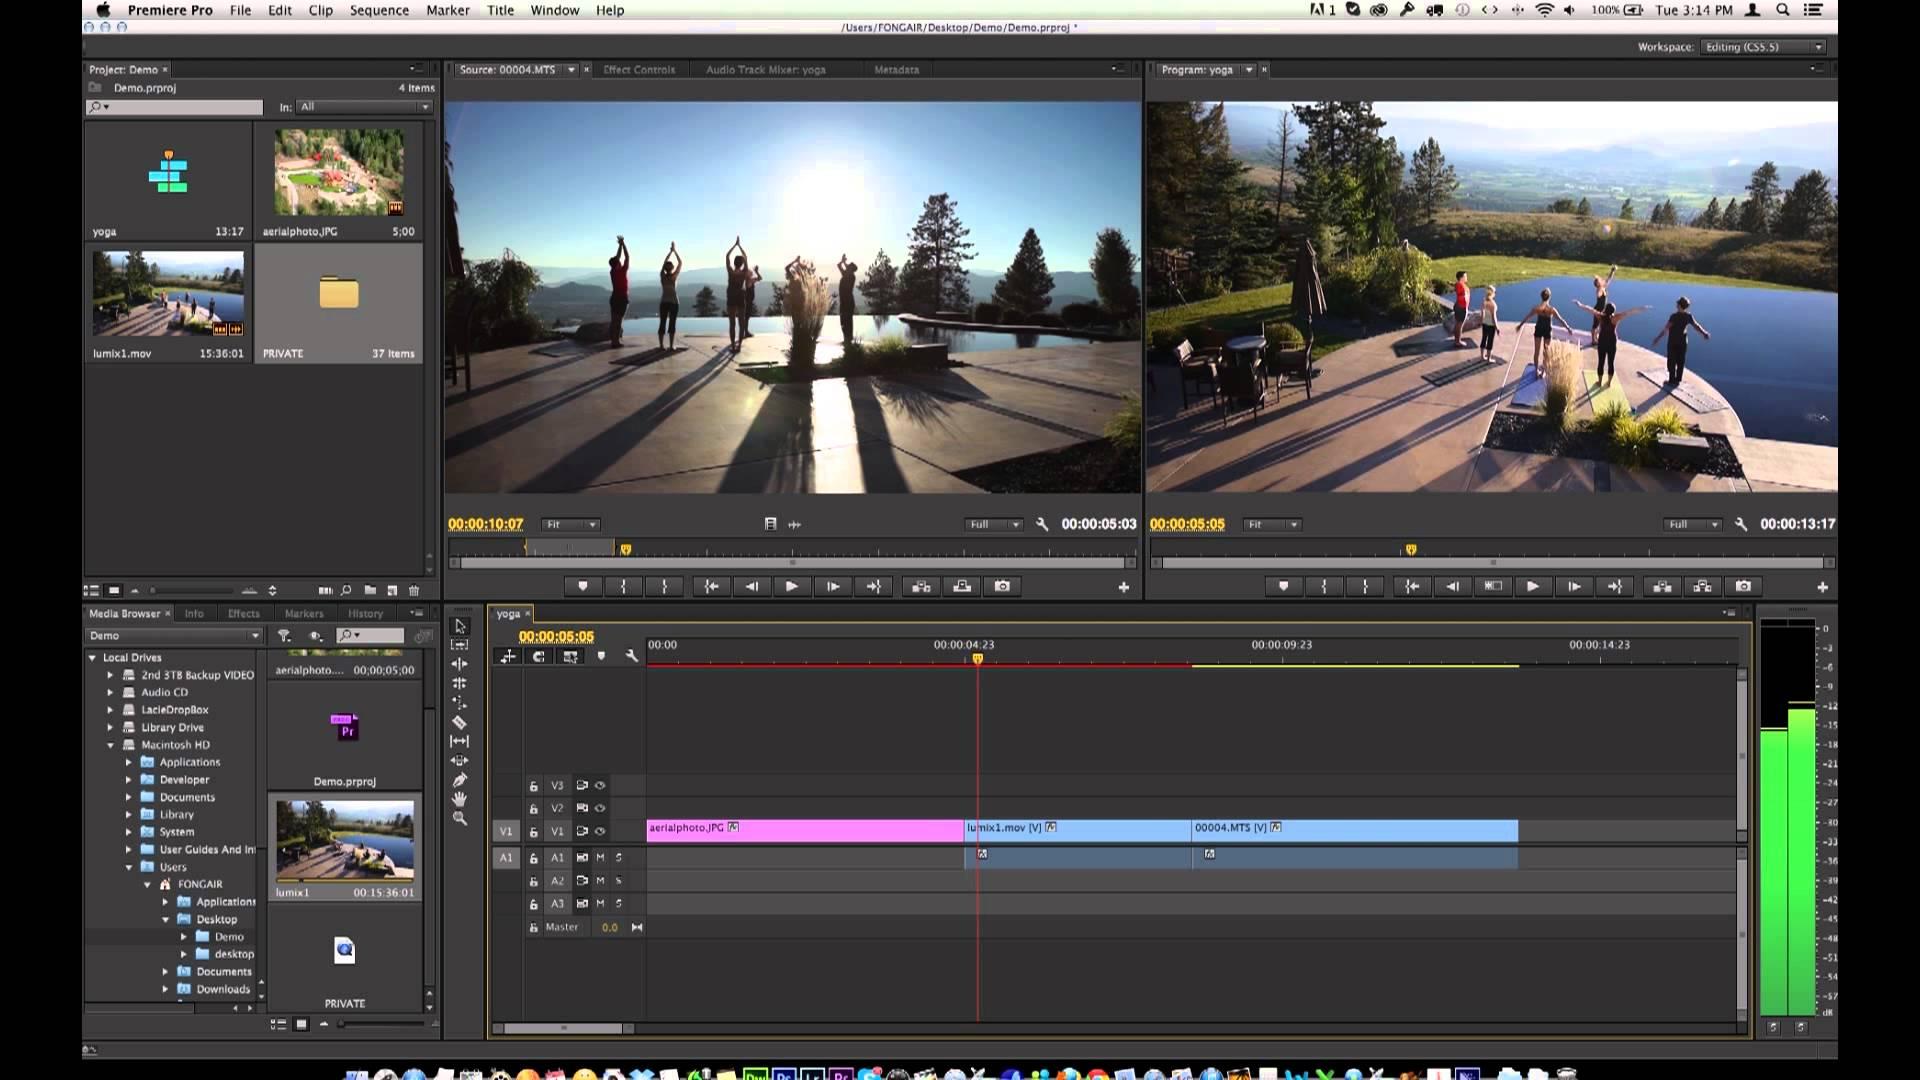 Adobe Premiere Pro CC 2018 12.1.1.10 强大的视频编辑软件